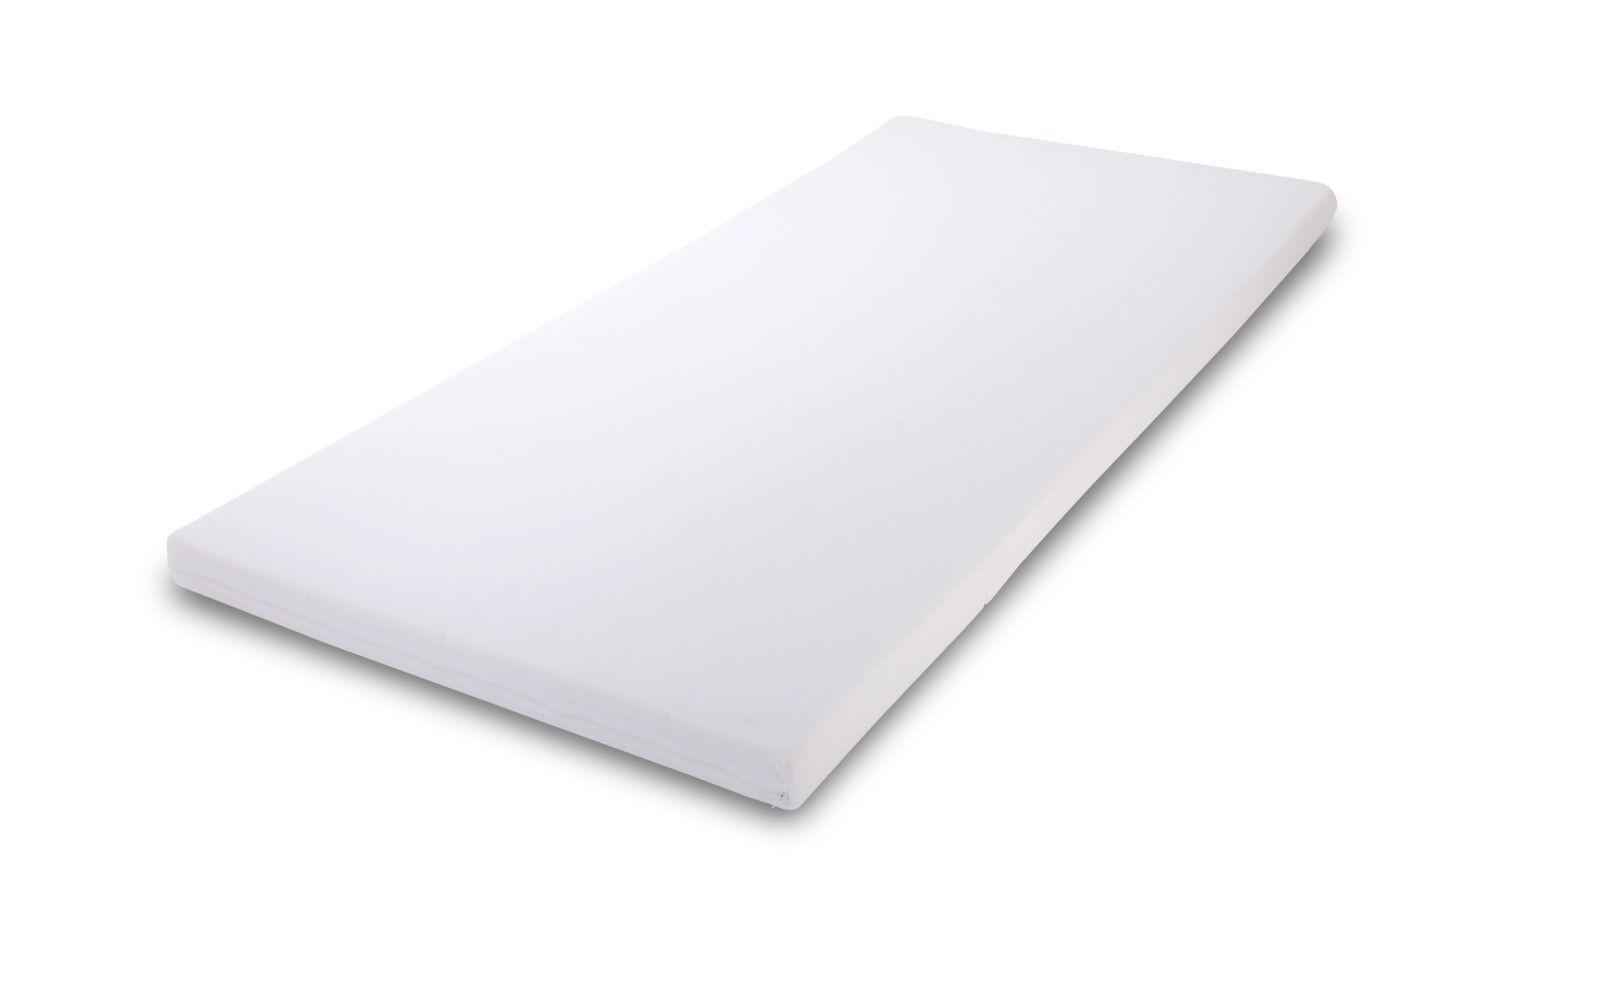 Cold foam mattress prougeection layer top hat schaumauflage for height